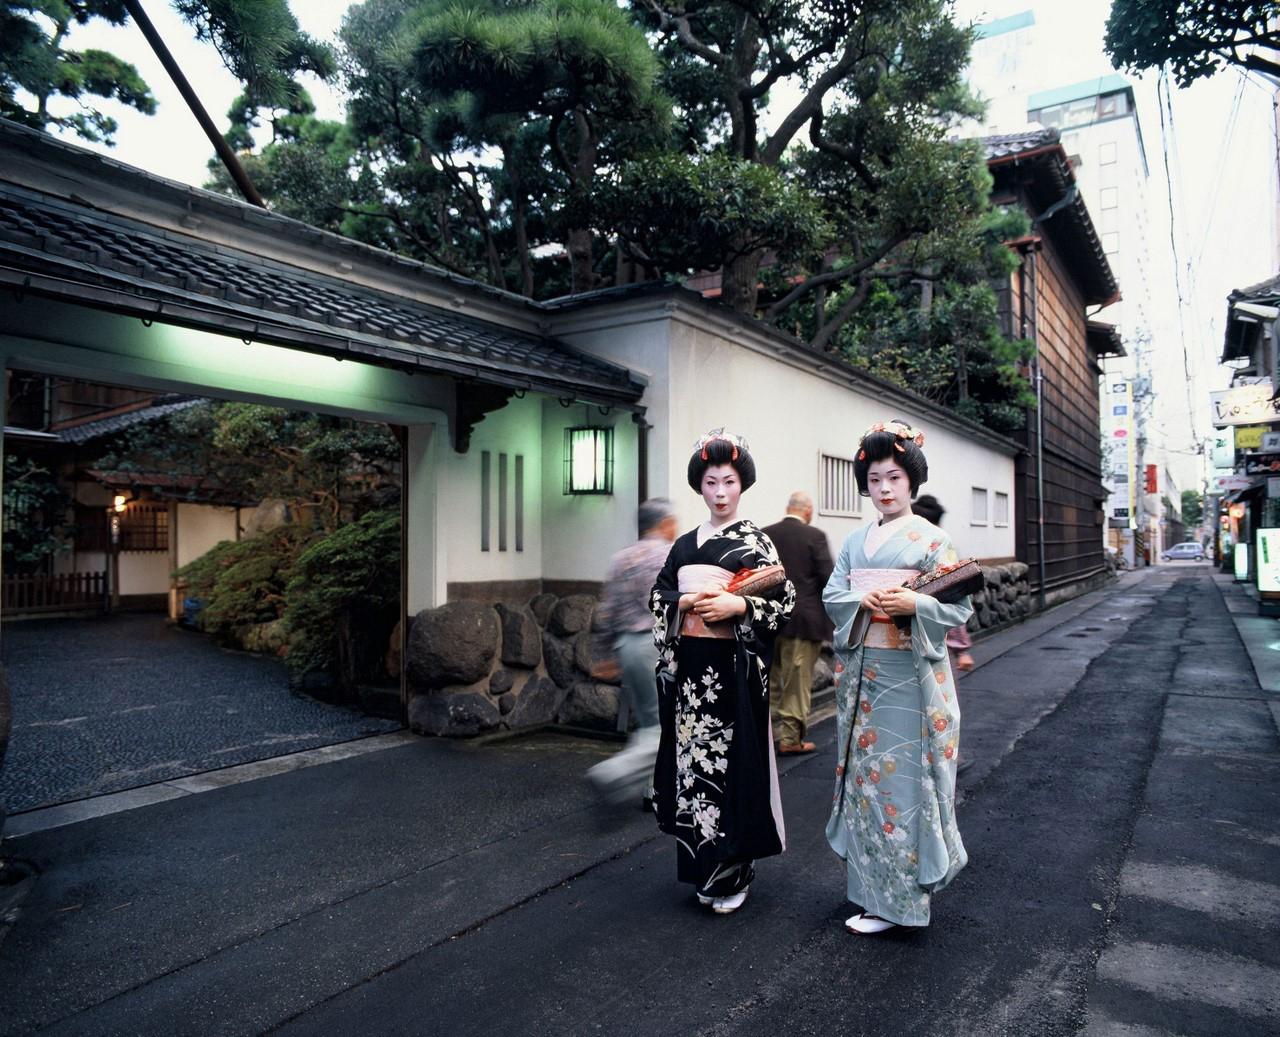 Niigata is considered one of Japan's most prestigious areas for geisha. (Niigata Visitors & Convention Bureau/JNTO)